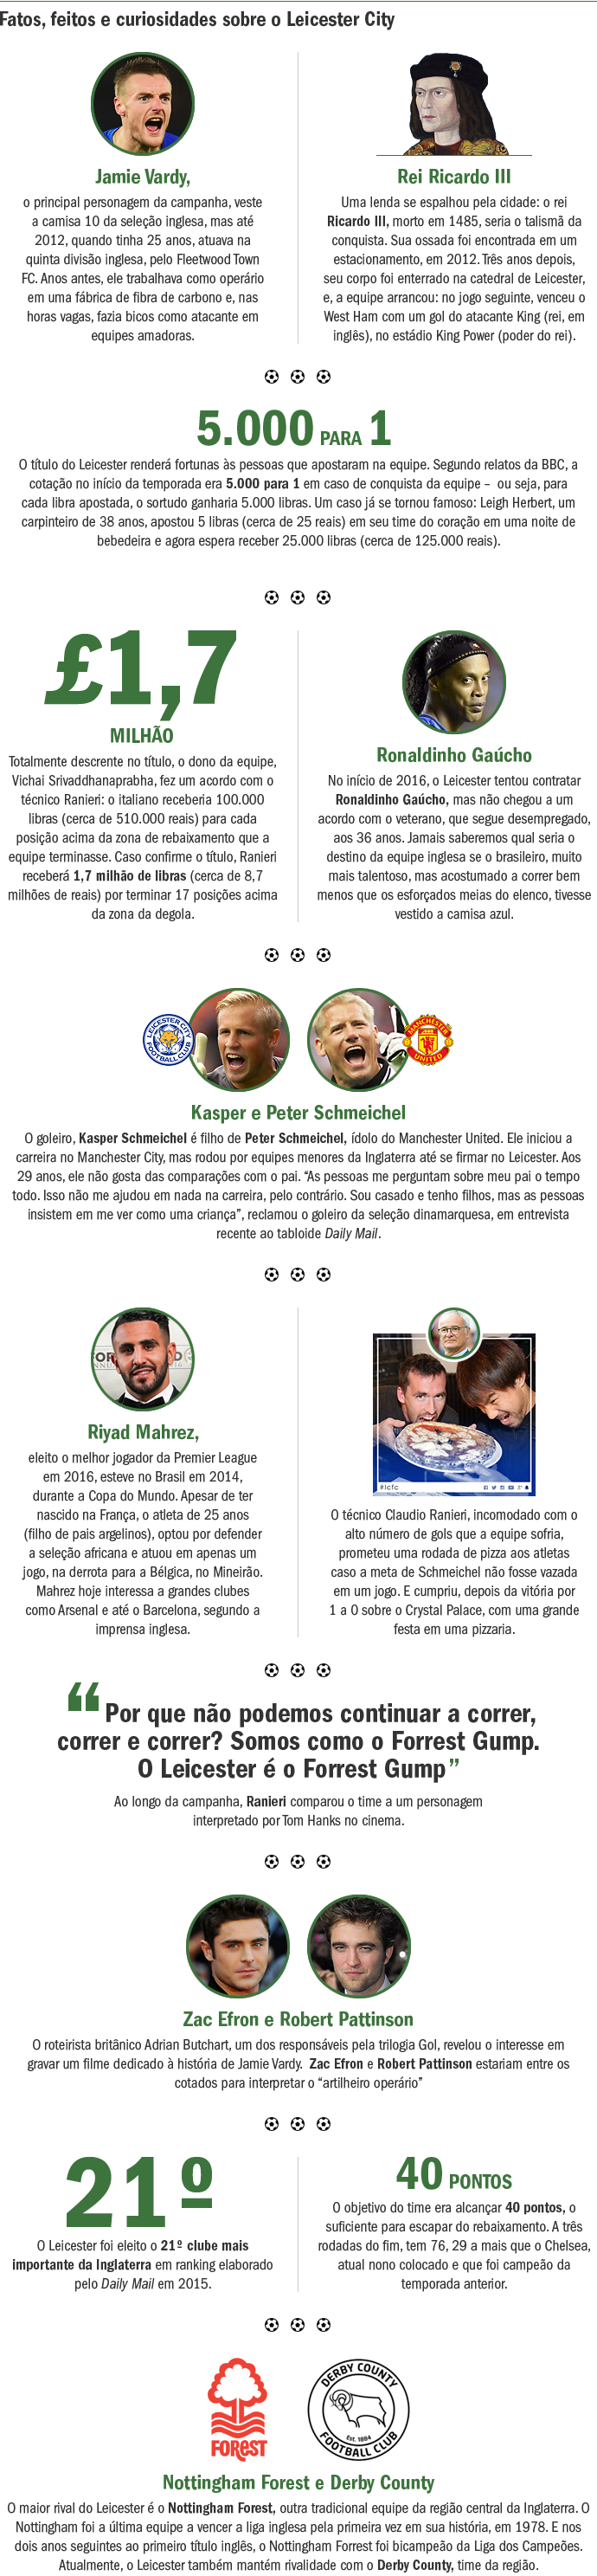 Fatos, feitos e curiosidades sobre o Leicester City